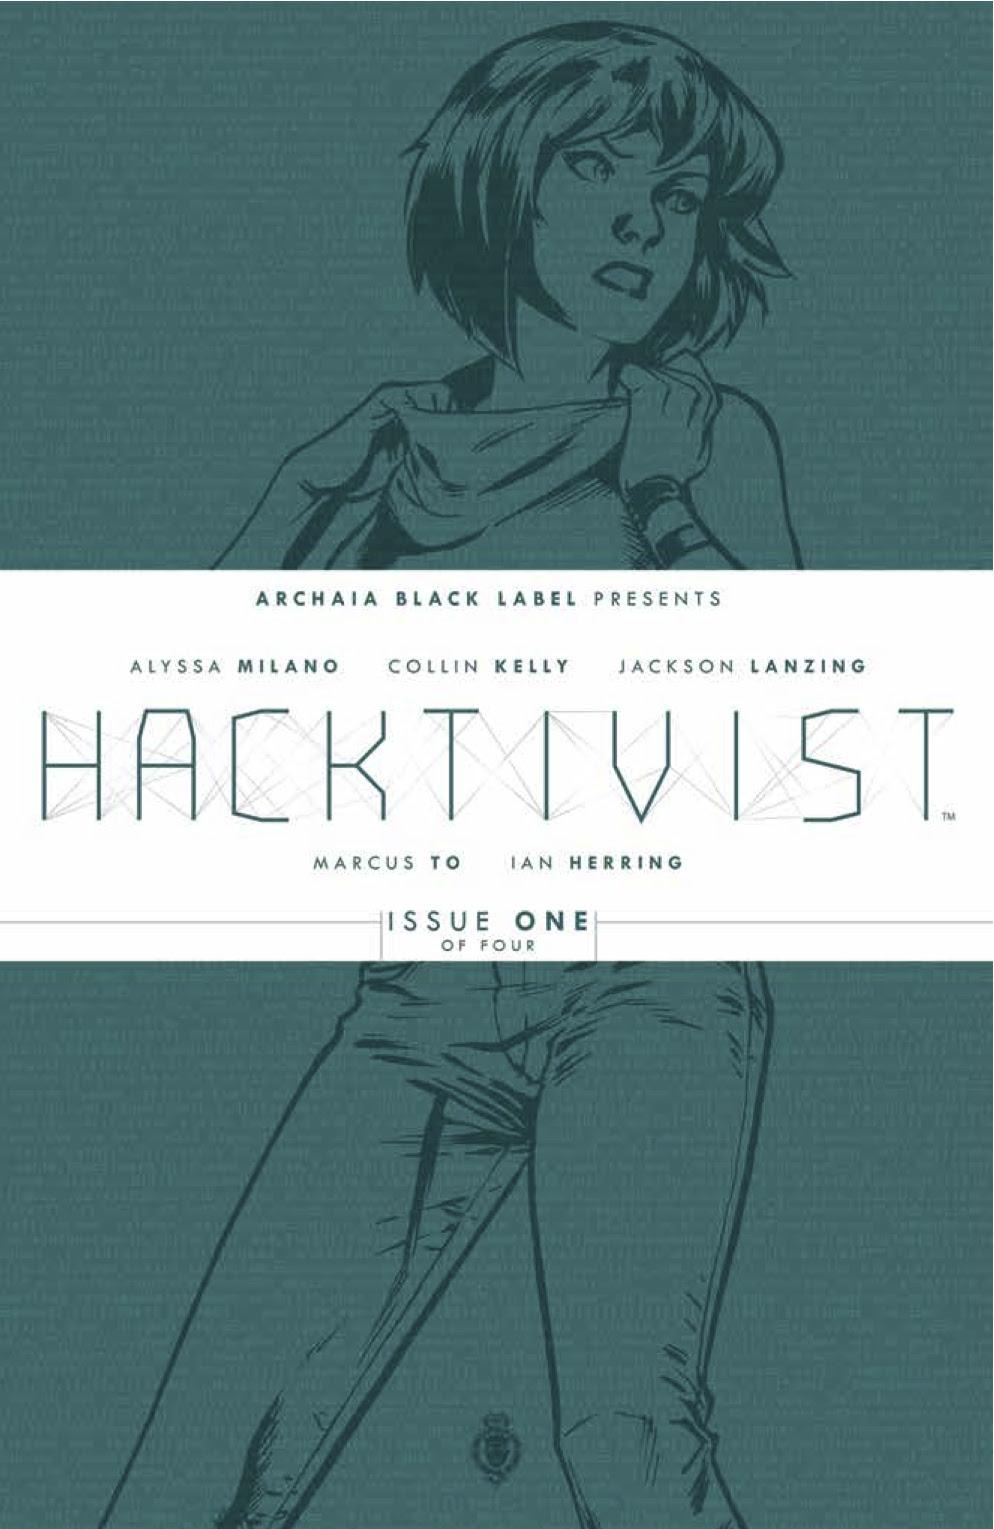 Archaia Announces Alyssa Milano's Cyber Thriller Limited Series Hacktivist